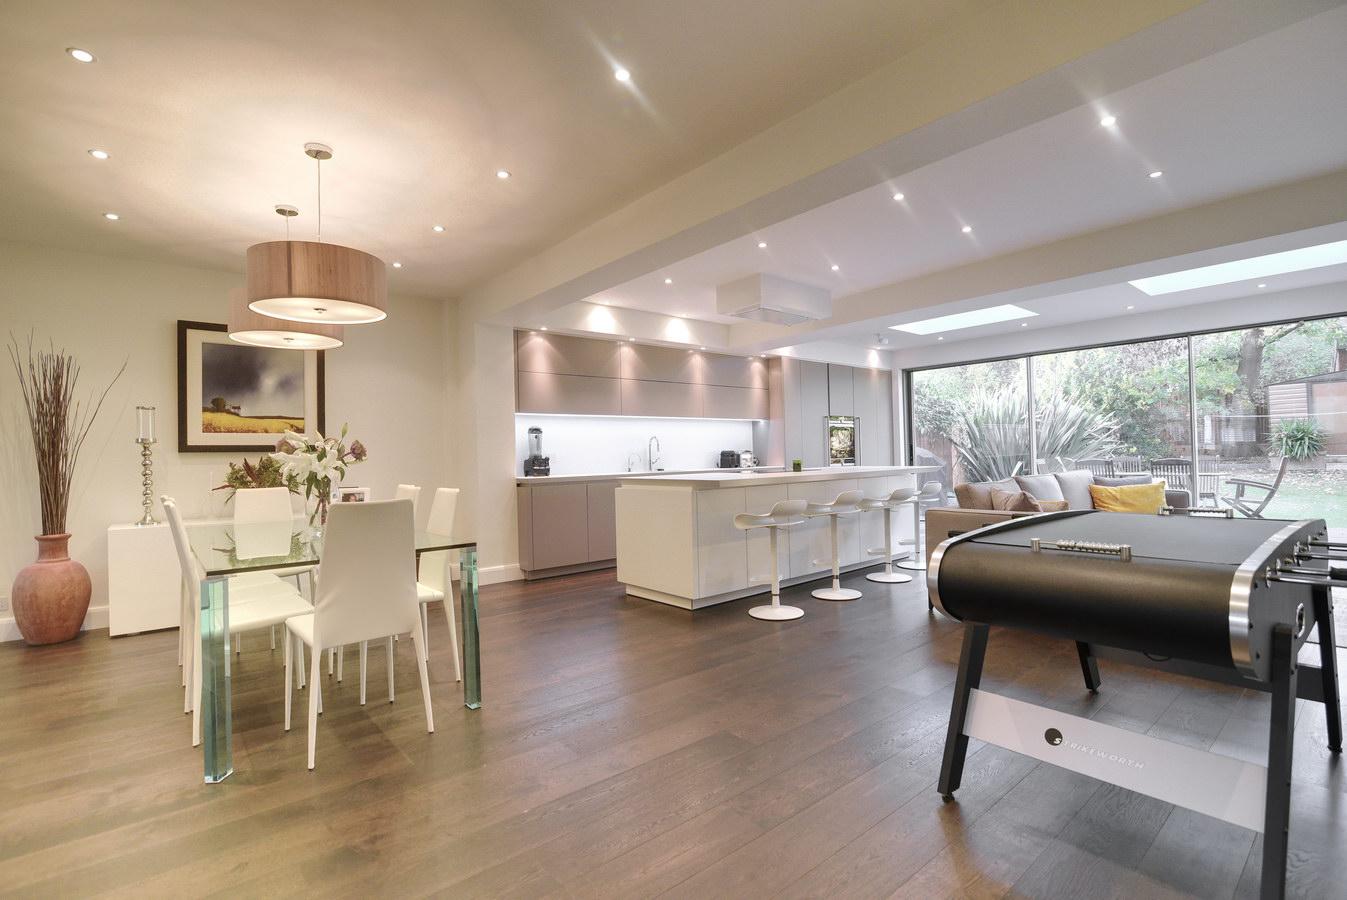 Golders-Green-Warendorf-Kitchen-London.jpg